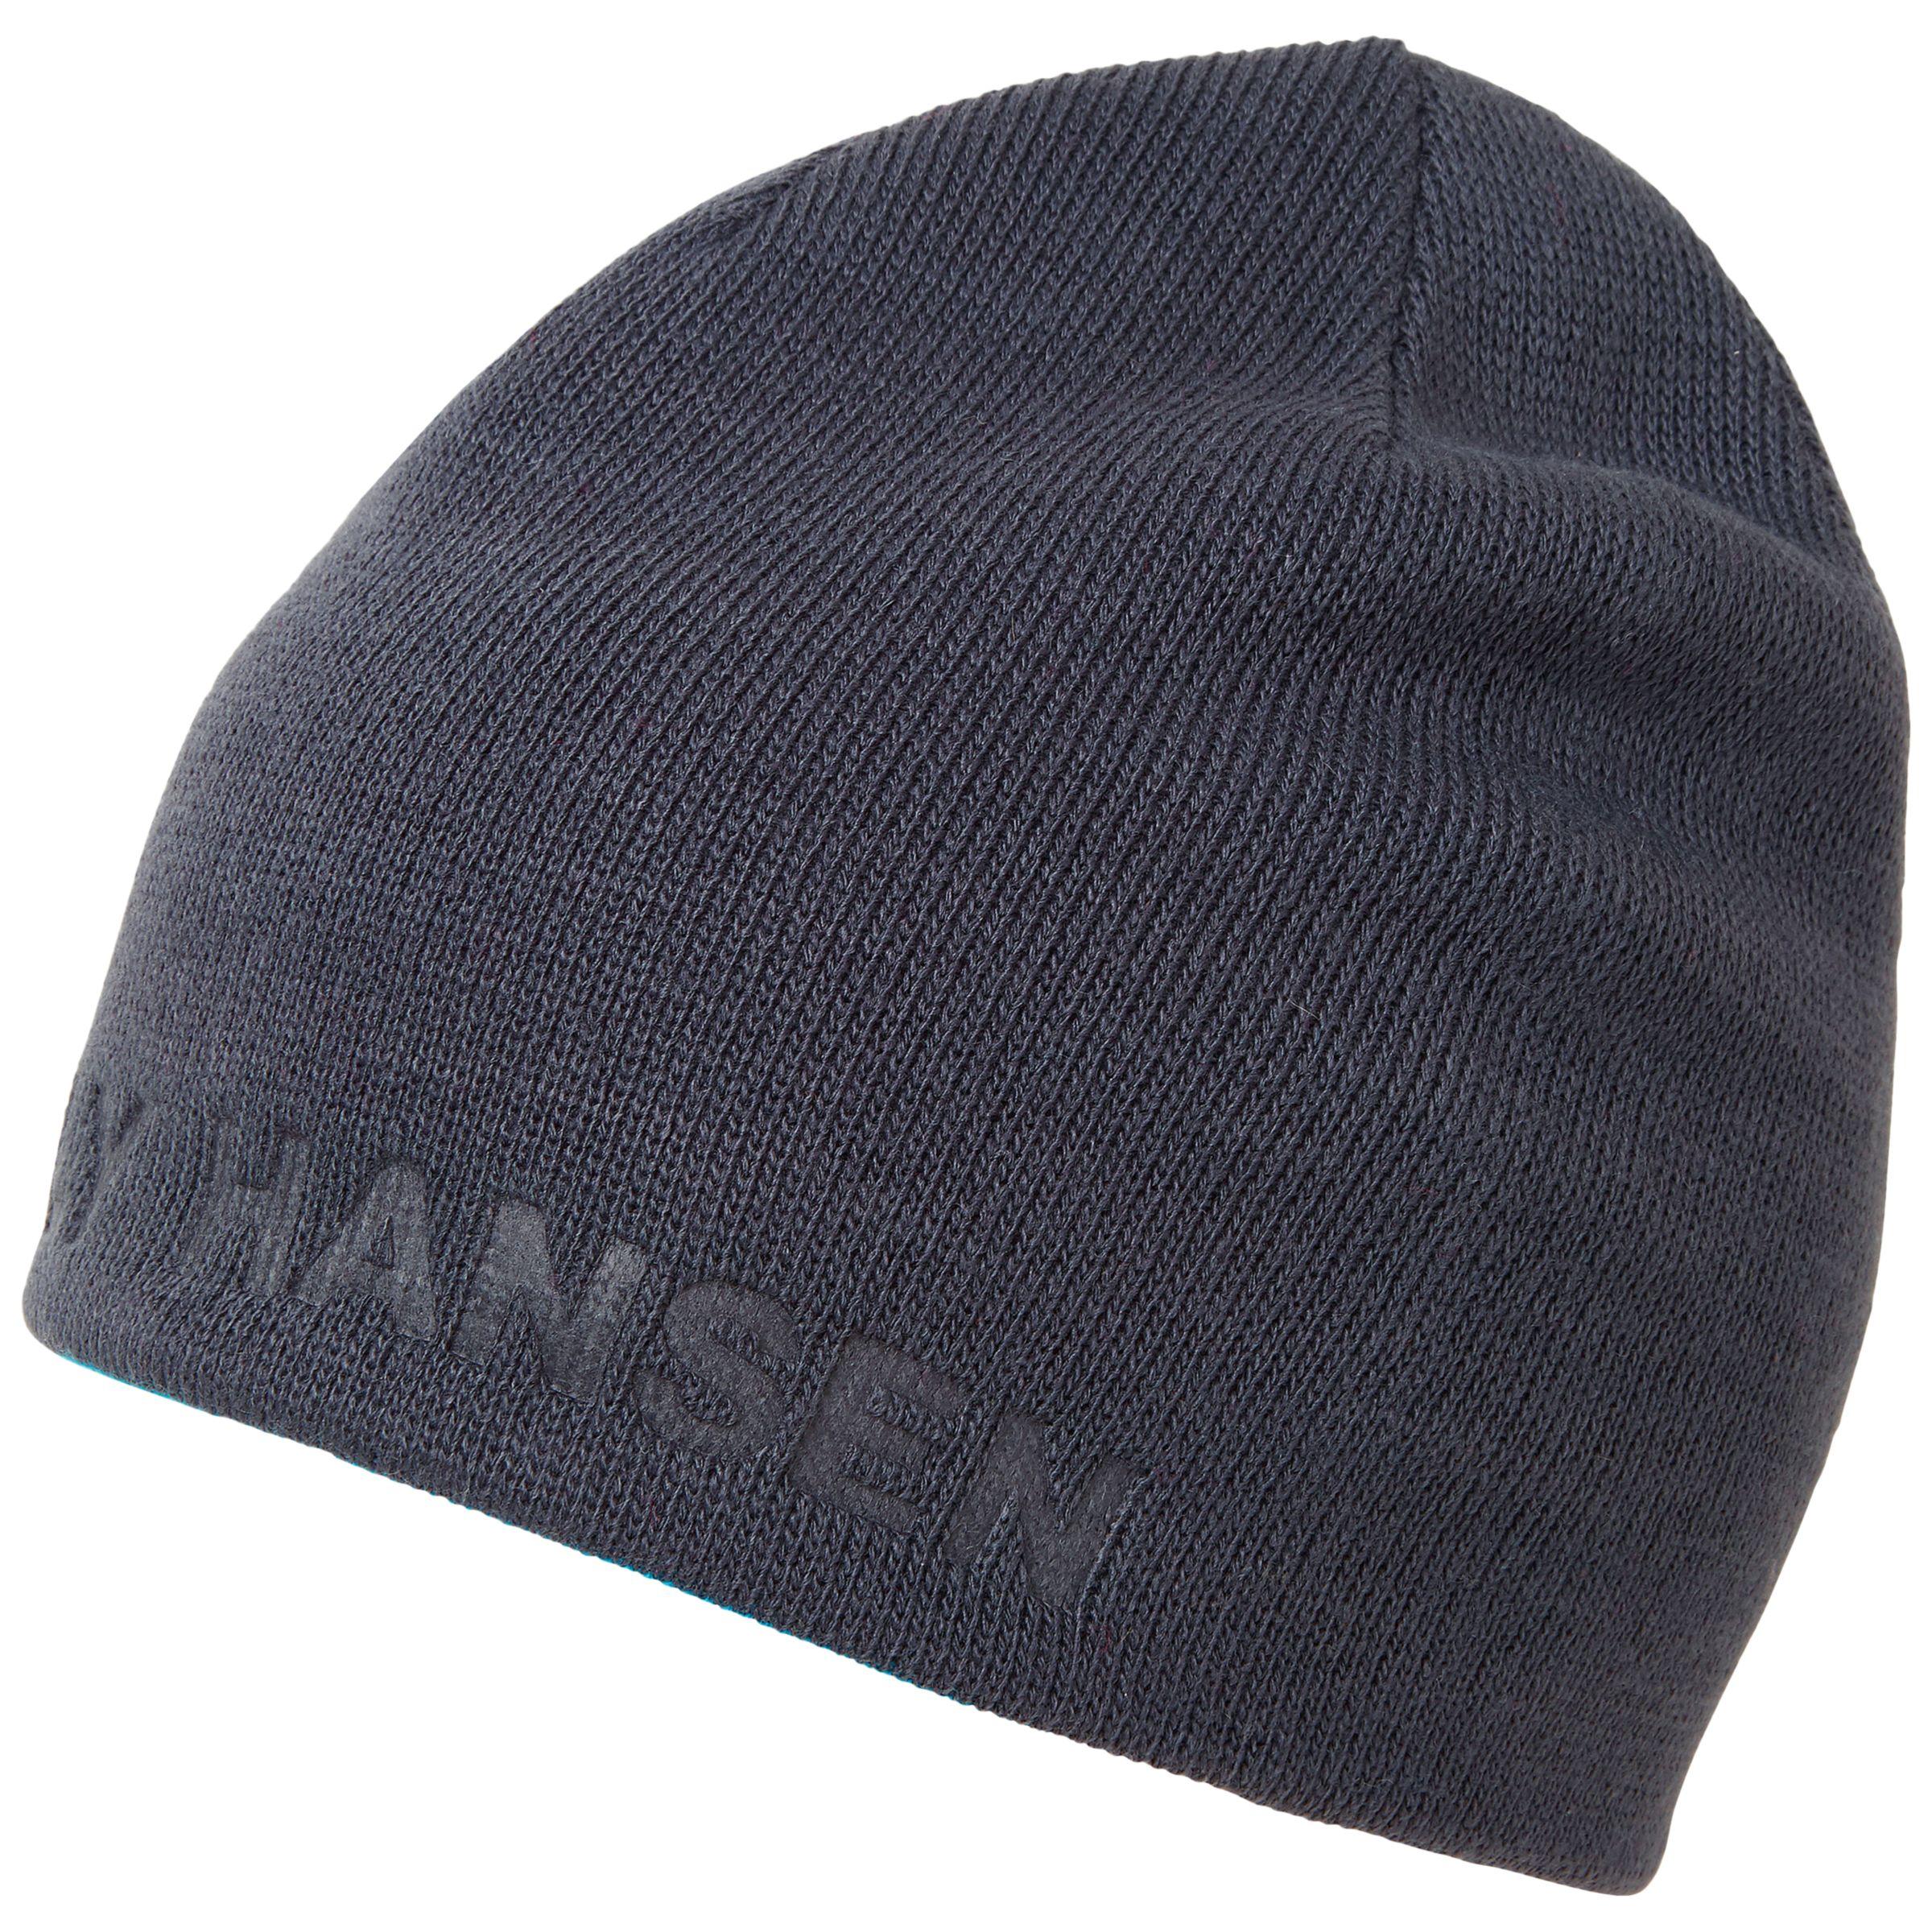 6234392fb16 Helly Hansen Outline Reversible Beanie Hat